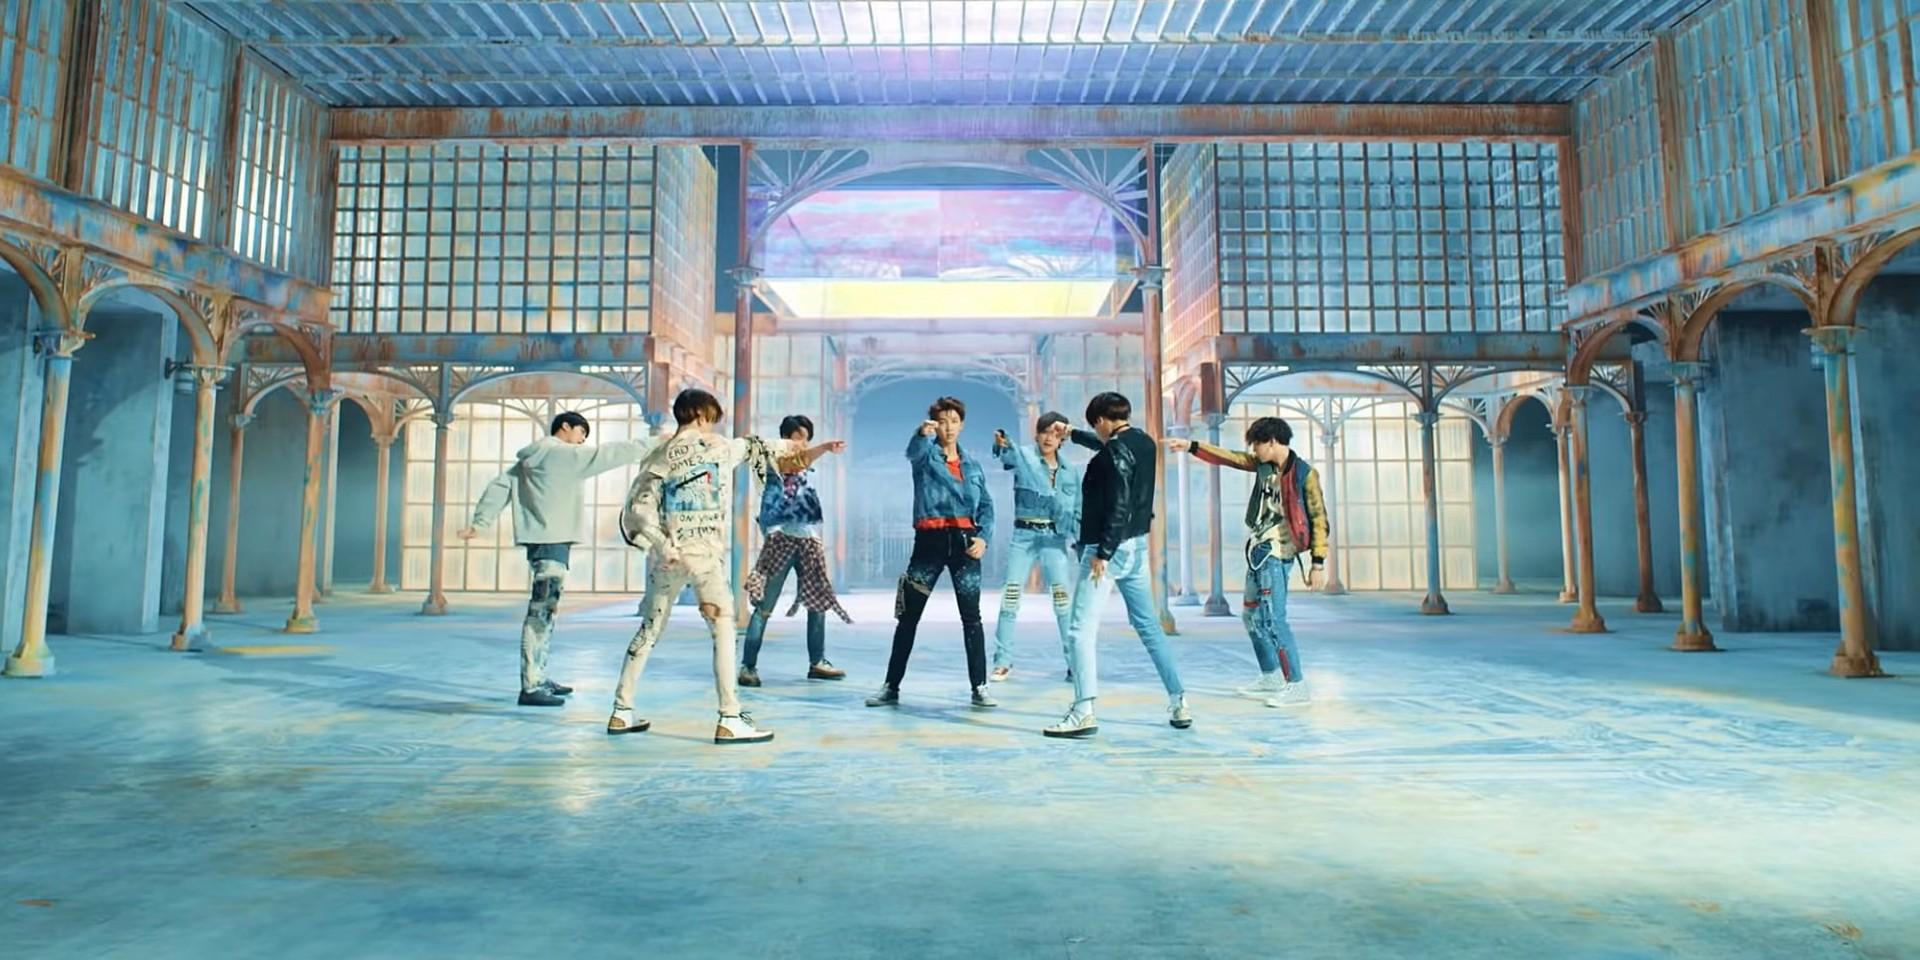 BTS' 'Fake Love' and 'IDOL' surpass 1 billion views on YouTube